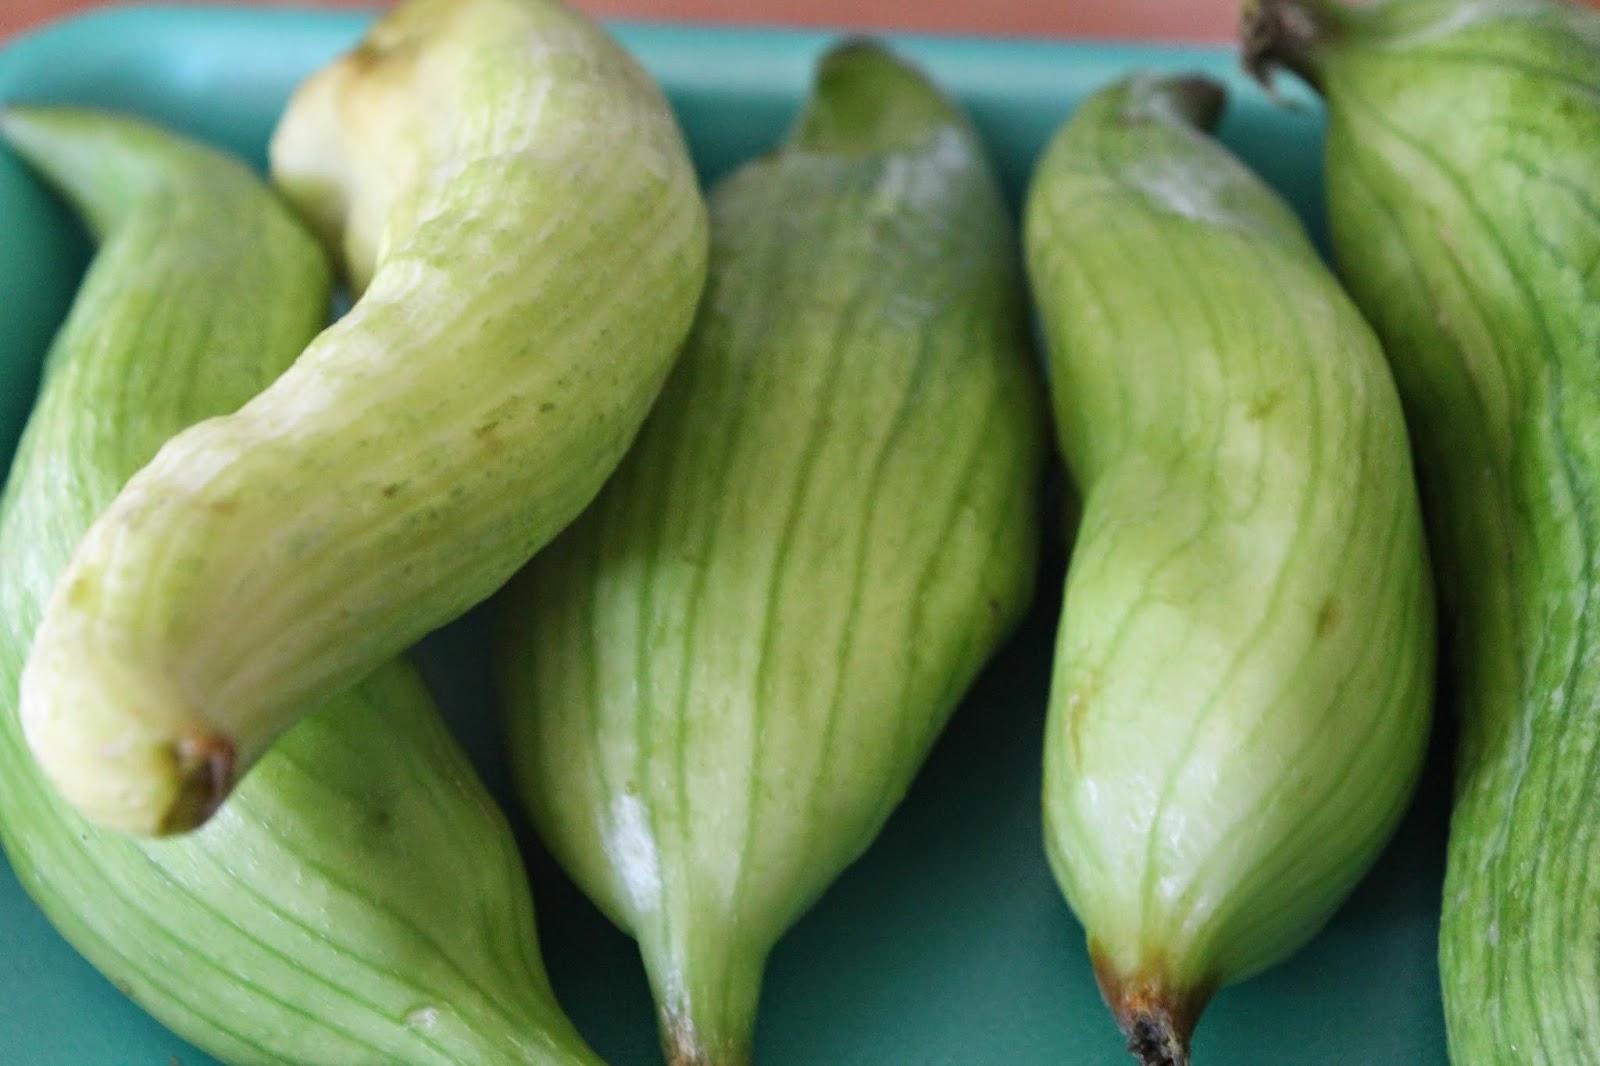 Gastrolamas: Achogchas rellenas de carne picada